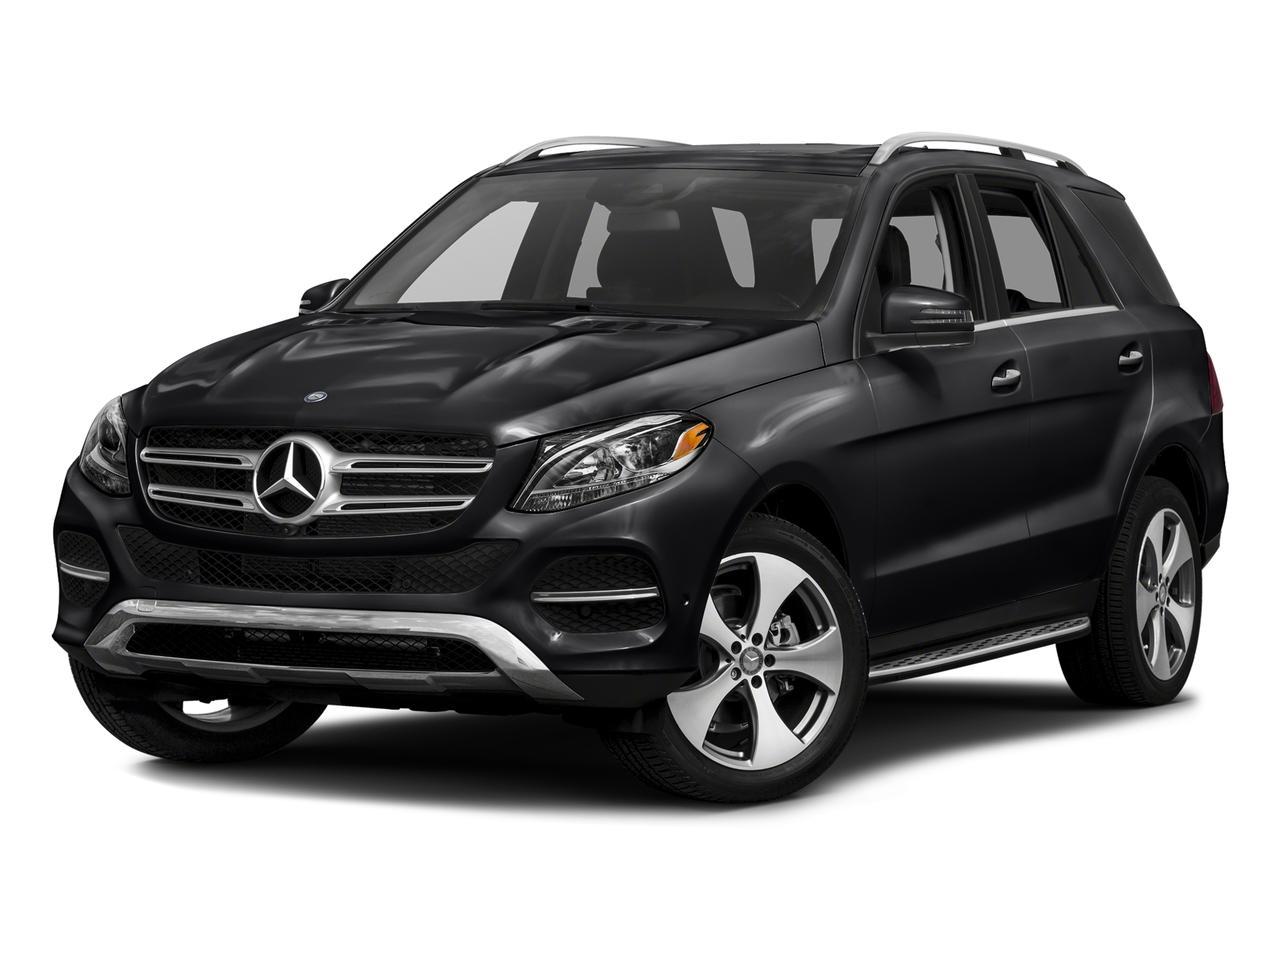 2016 Mercedes-Benz GLE Vehicle Photo in Appleton, WI 54913